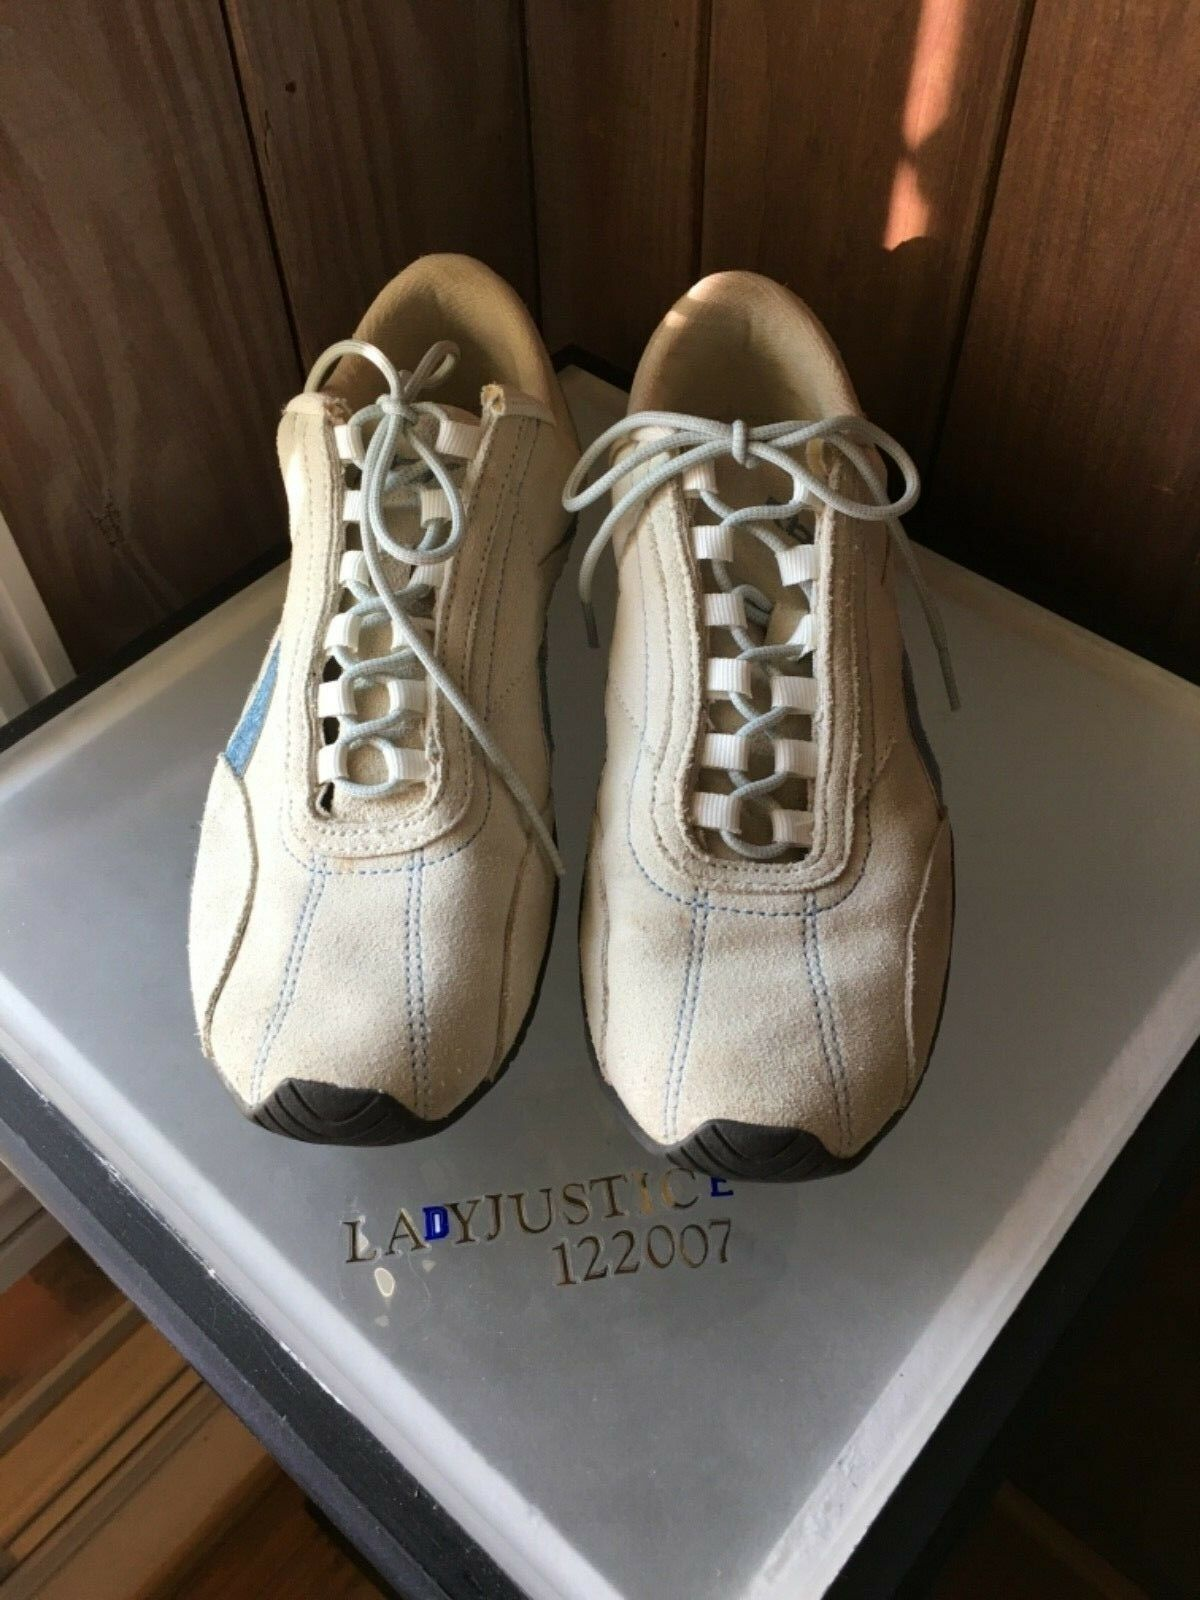 Reebok Crema Gamuza Tenis Zapatos Atléticos 8 para mujer-Talla 8 Atléticos 7e1958